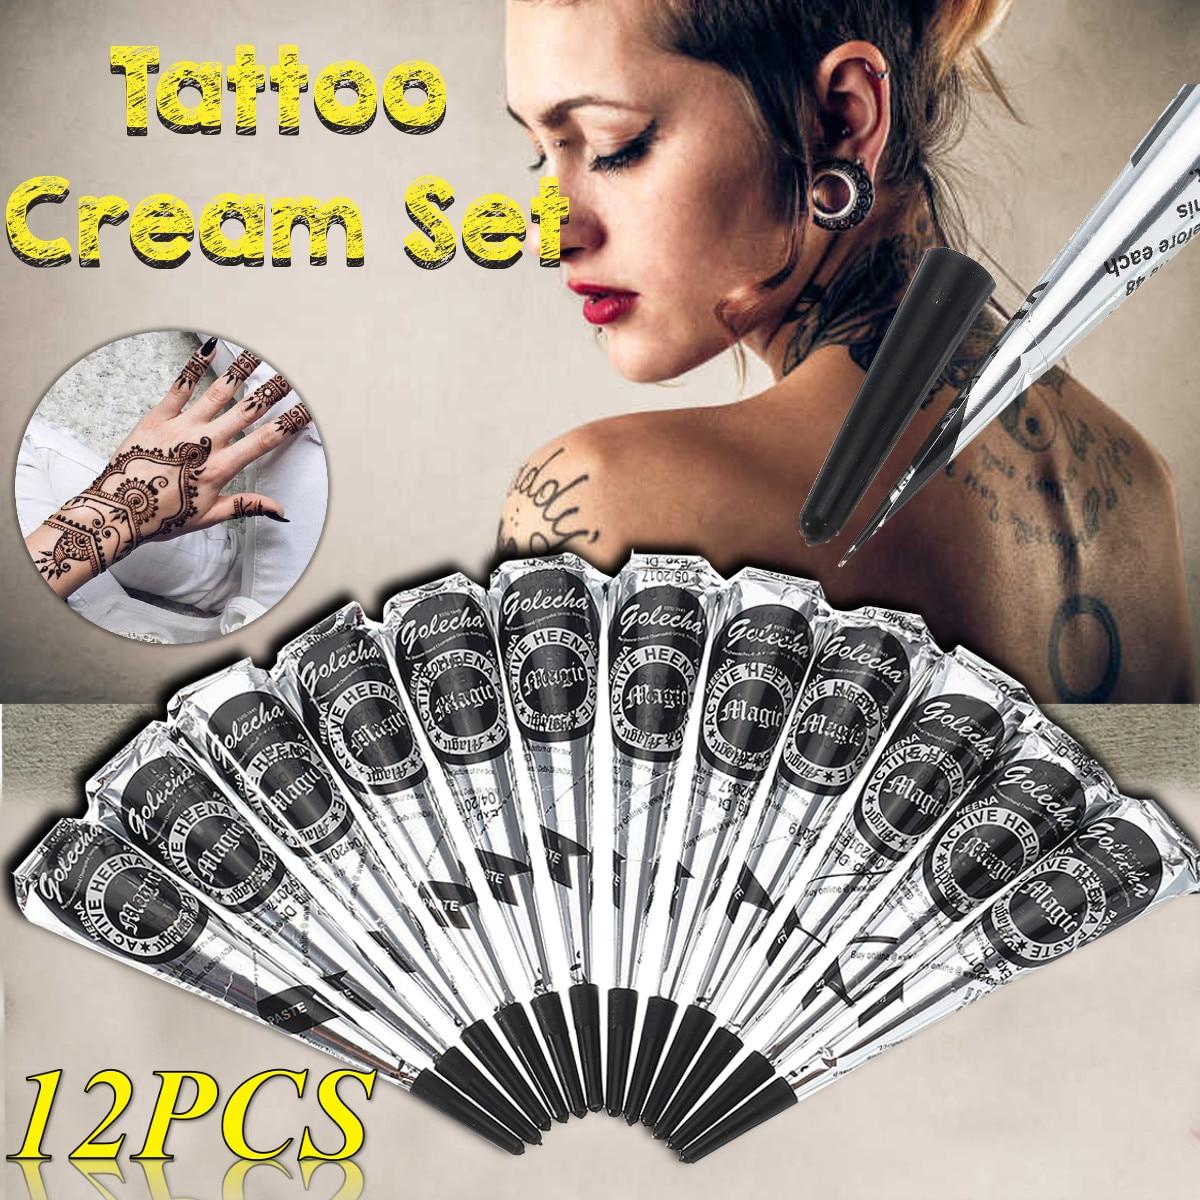 12Pcs 25g Golecha Natural Mehndi Henna Cones Indian Henna Tattoo Paste For Temporary Tattoo Sticker Mehndi Makeup Body Paint